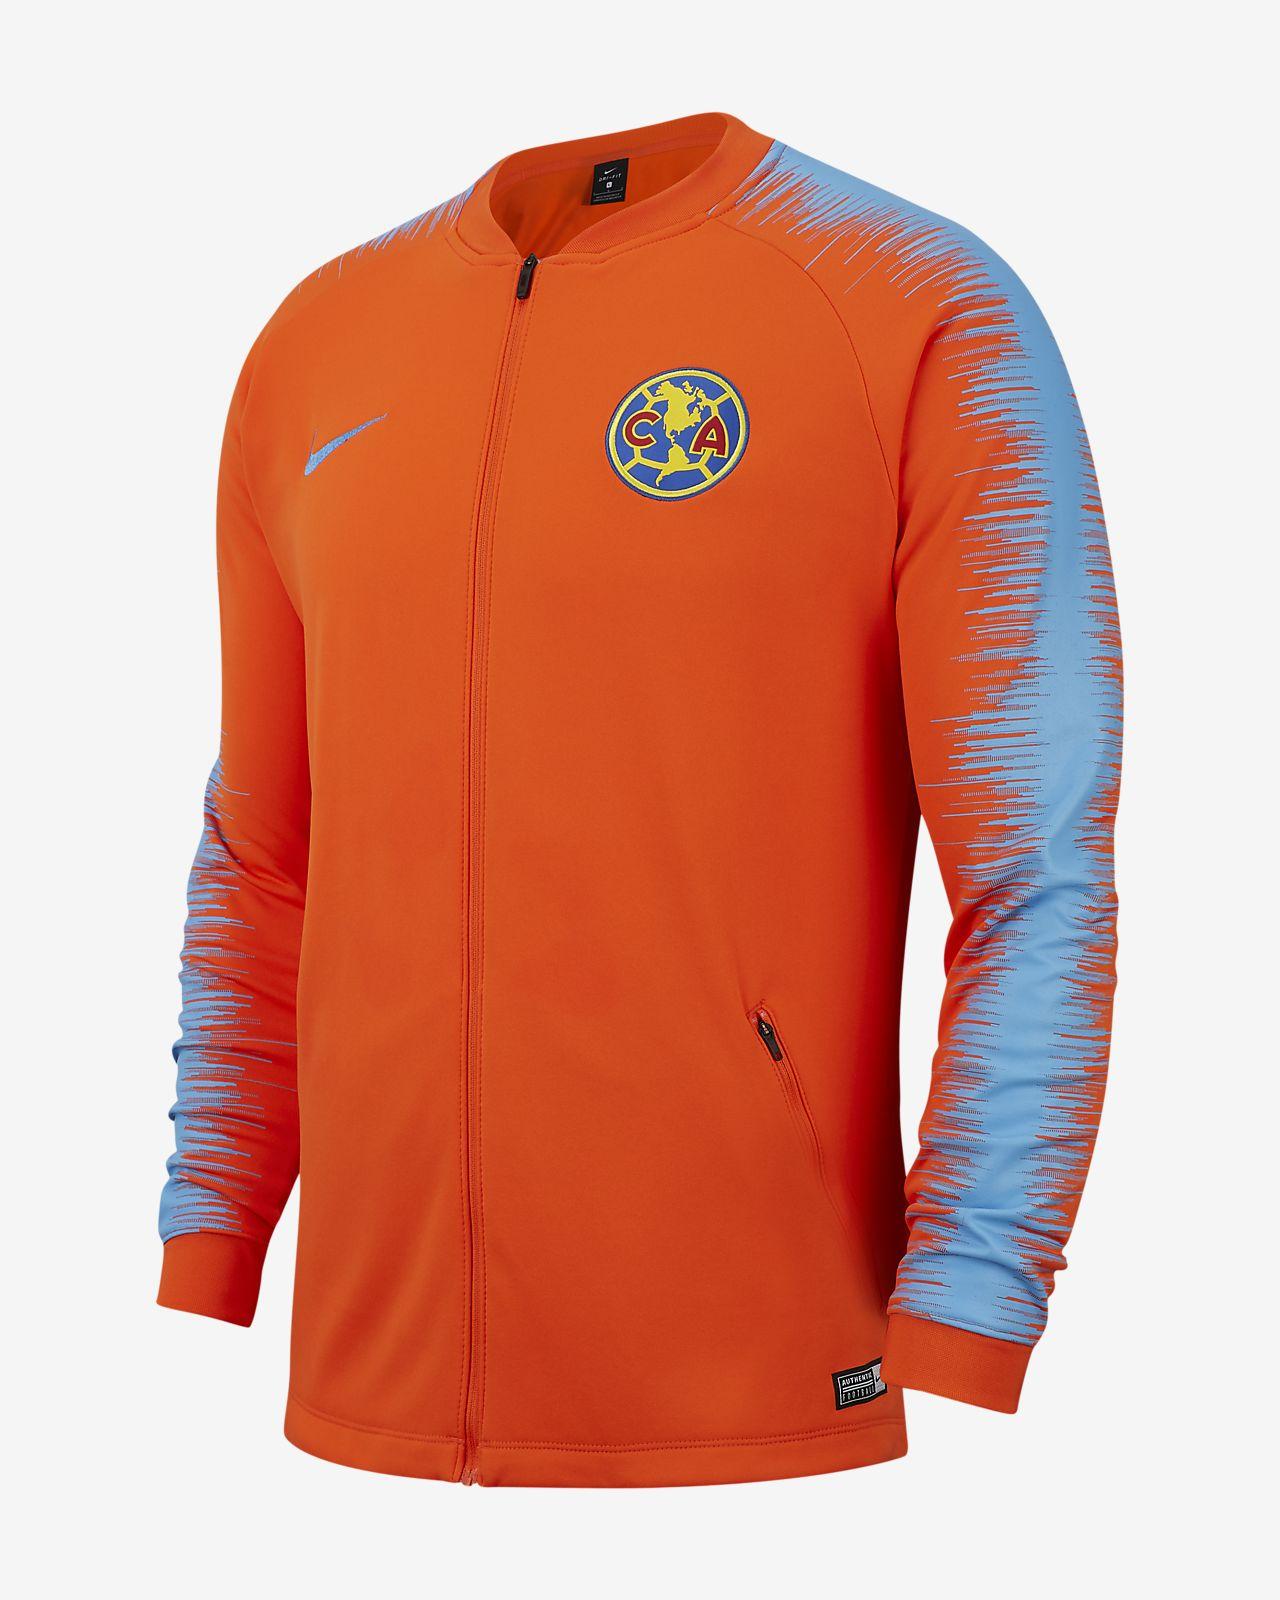 214e79b97 Club America Men s Soccer Jacket. Nike.com